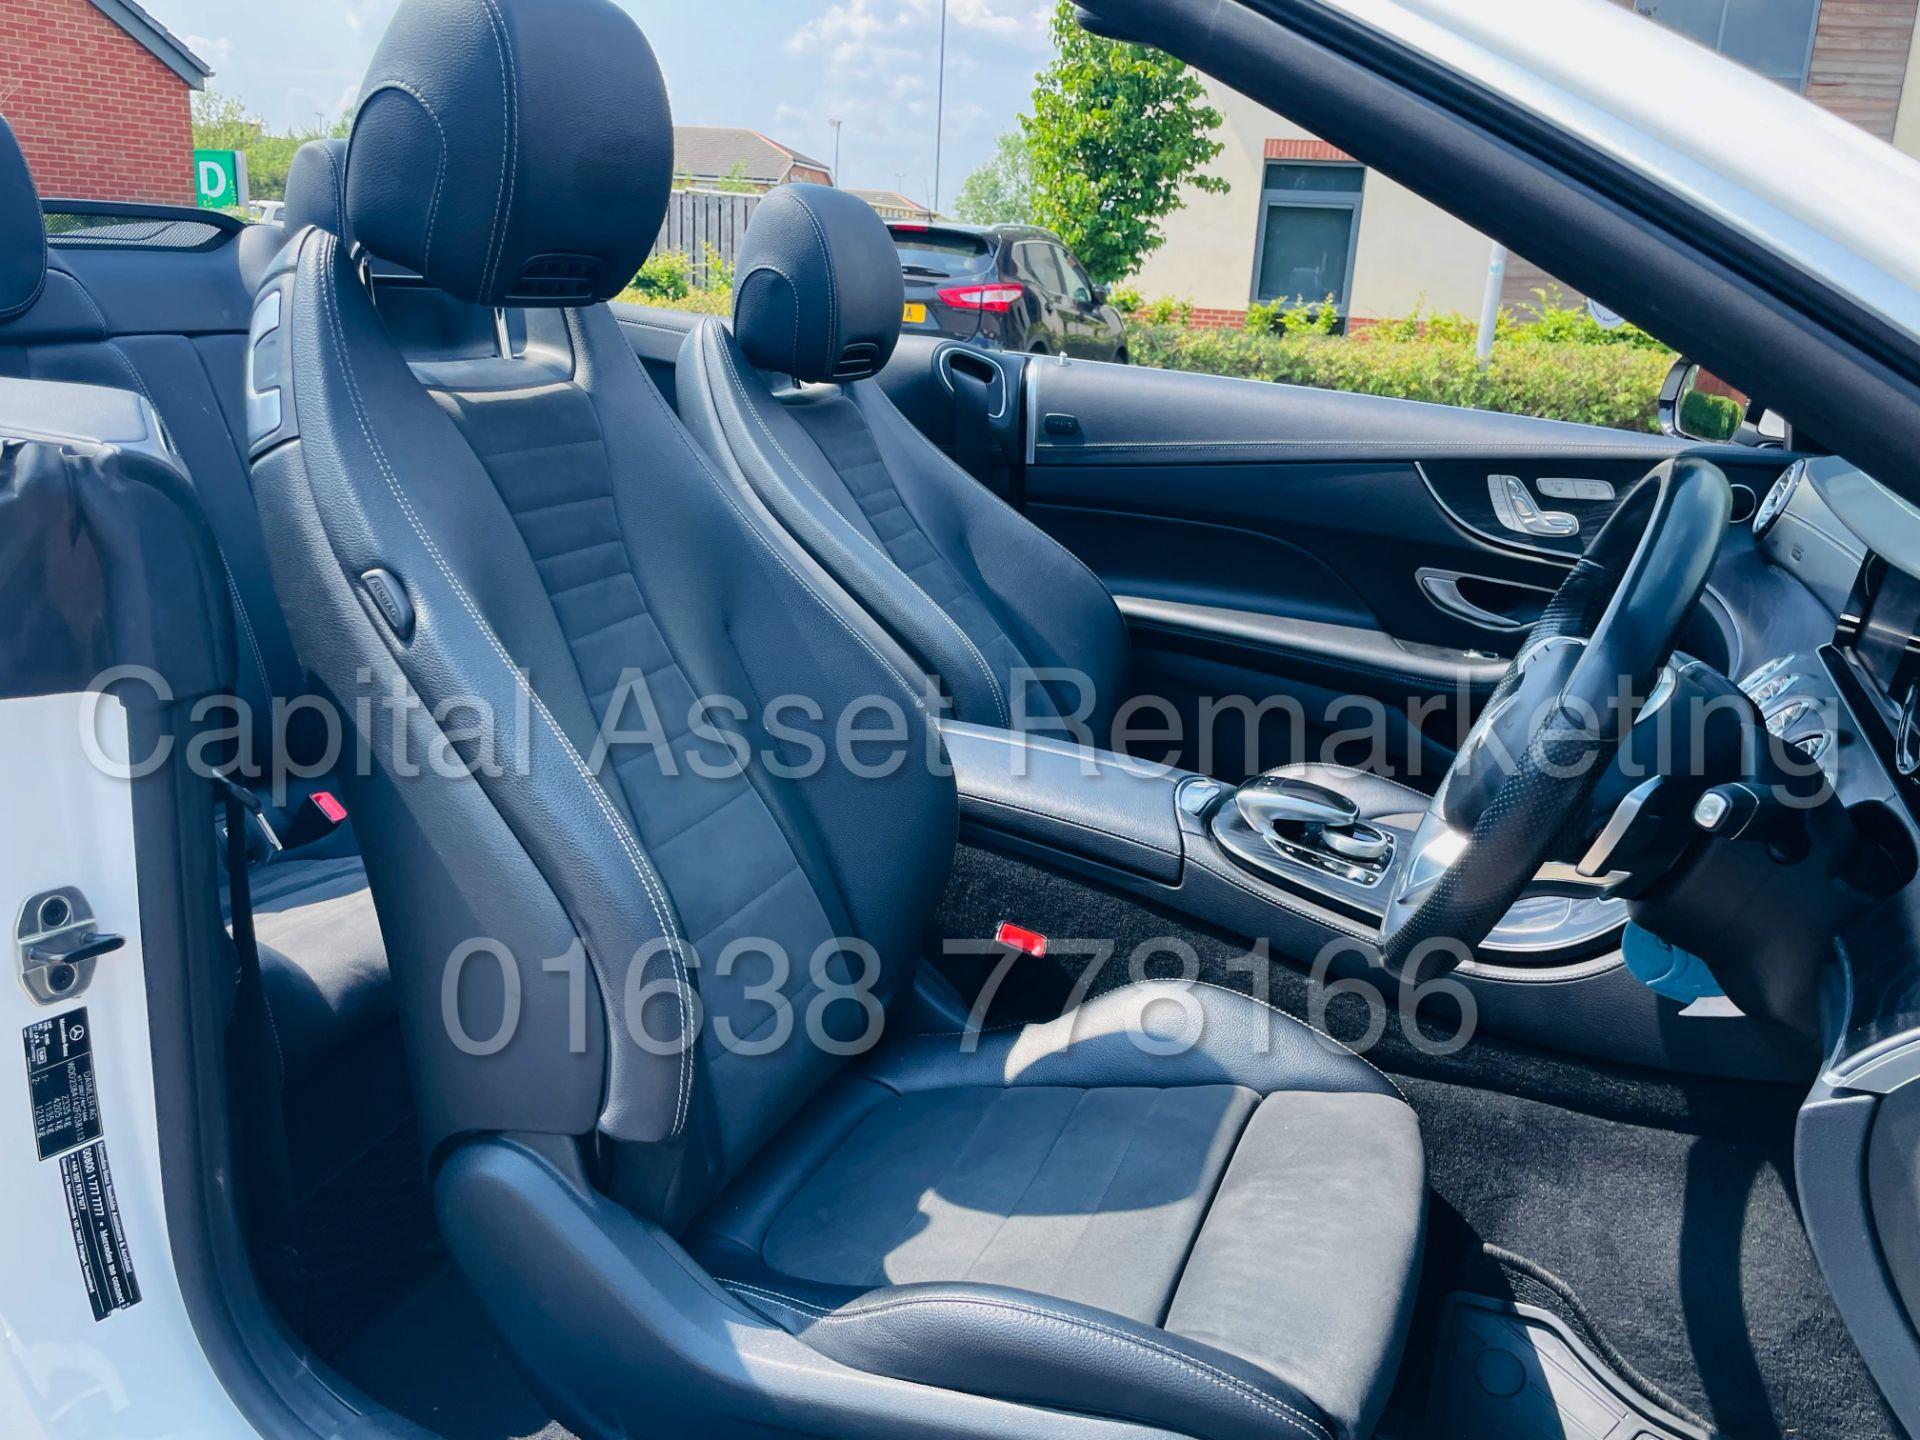 MERCEDES-BENZ E220d *AMG LINE PREMIUM - CABRIOLET* (2018 - EURO 6) '9G AUTO - LEATHER - SAT NAV' - Image 47 of 63